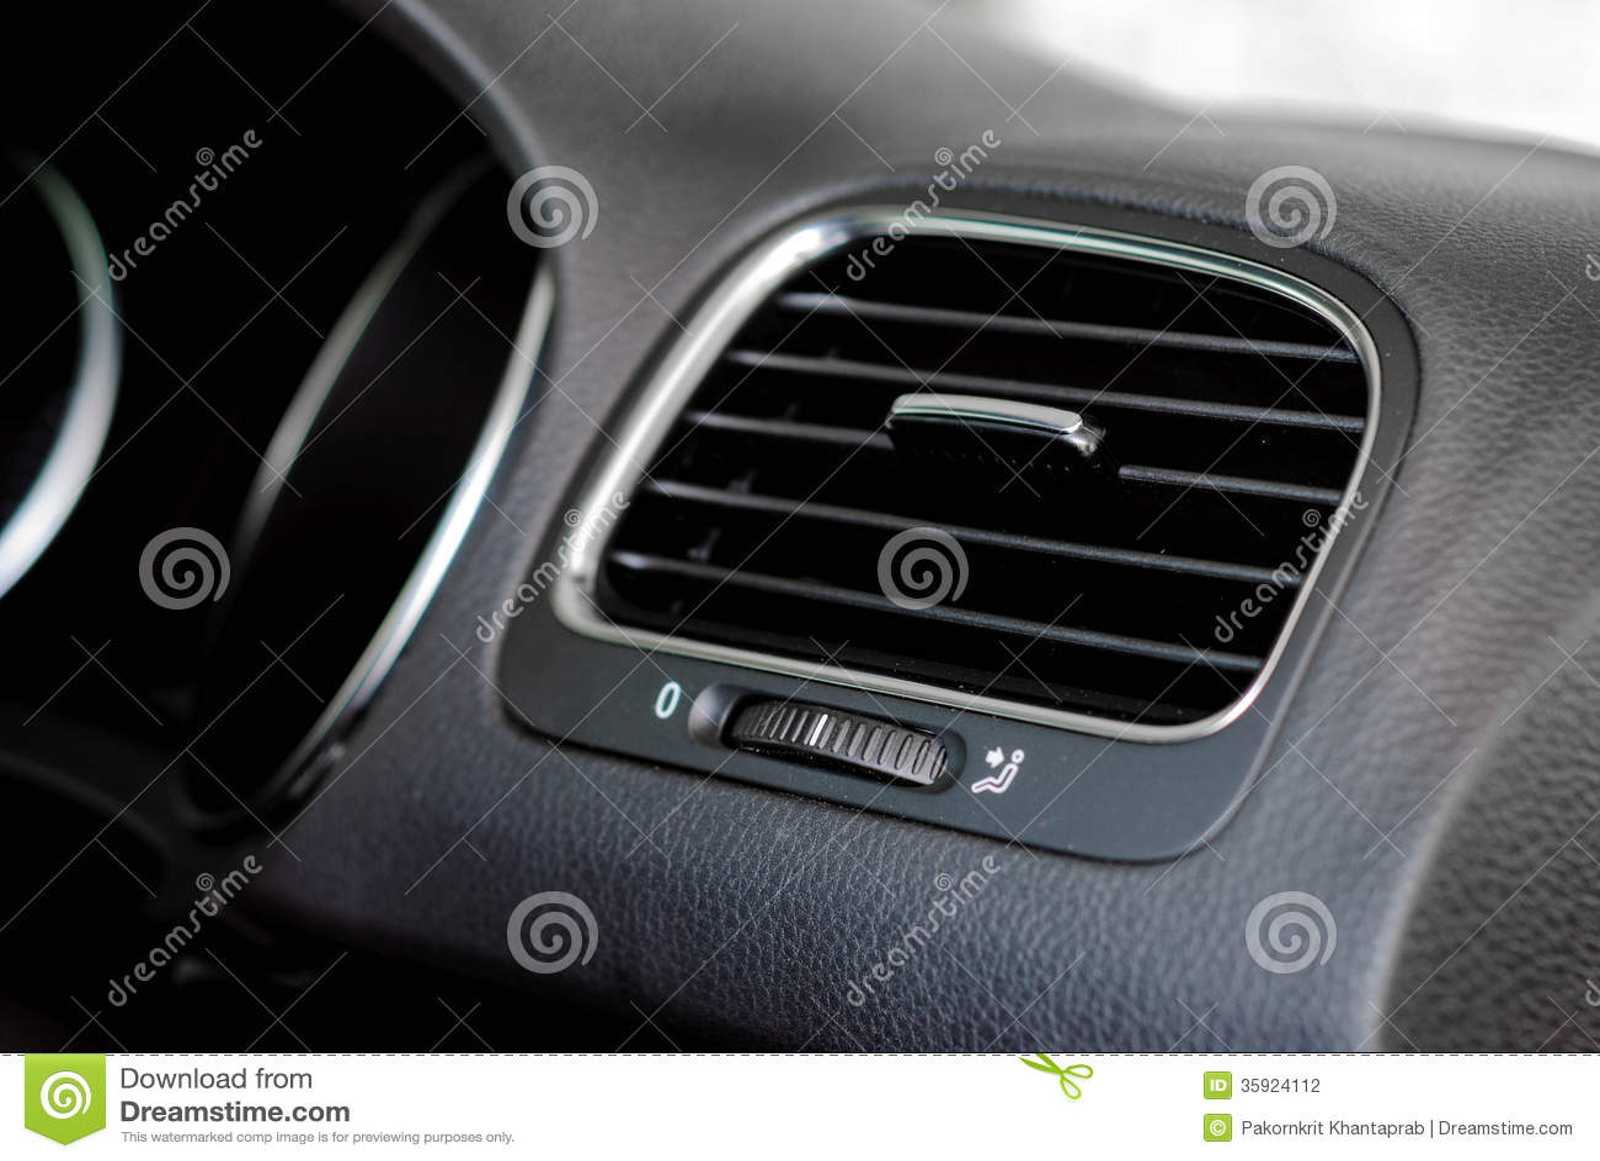 car air vent stock photography image 35924112. Black Bedroom Furniture Sets. Home Design Ideas